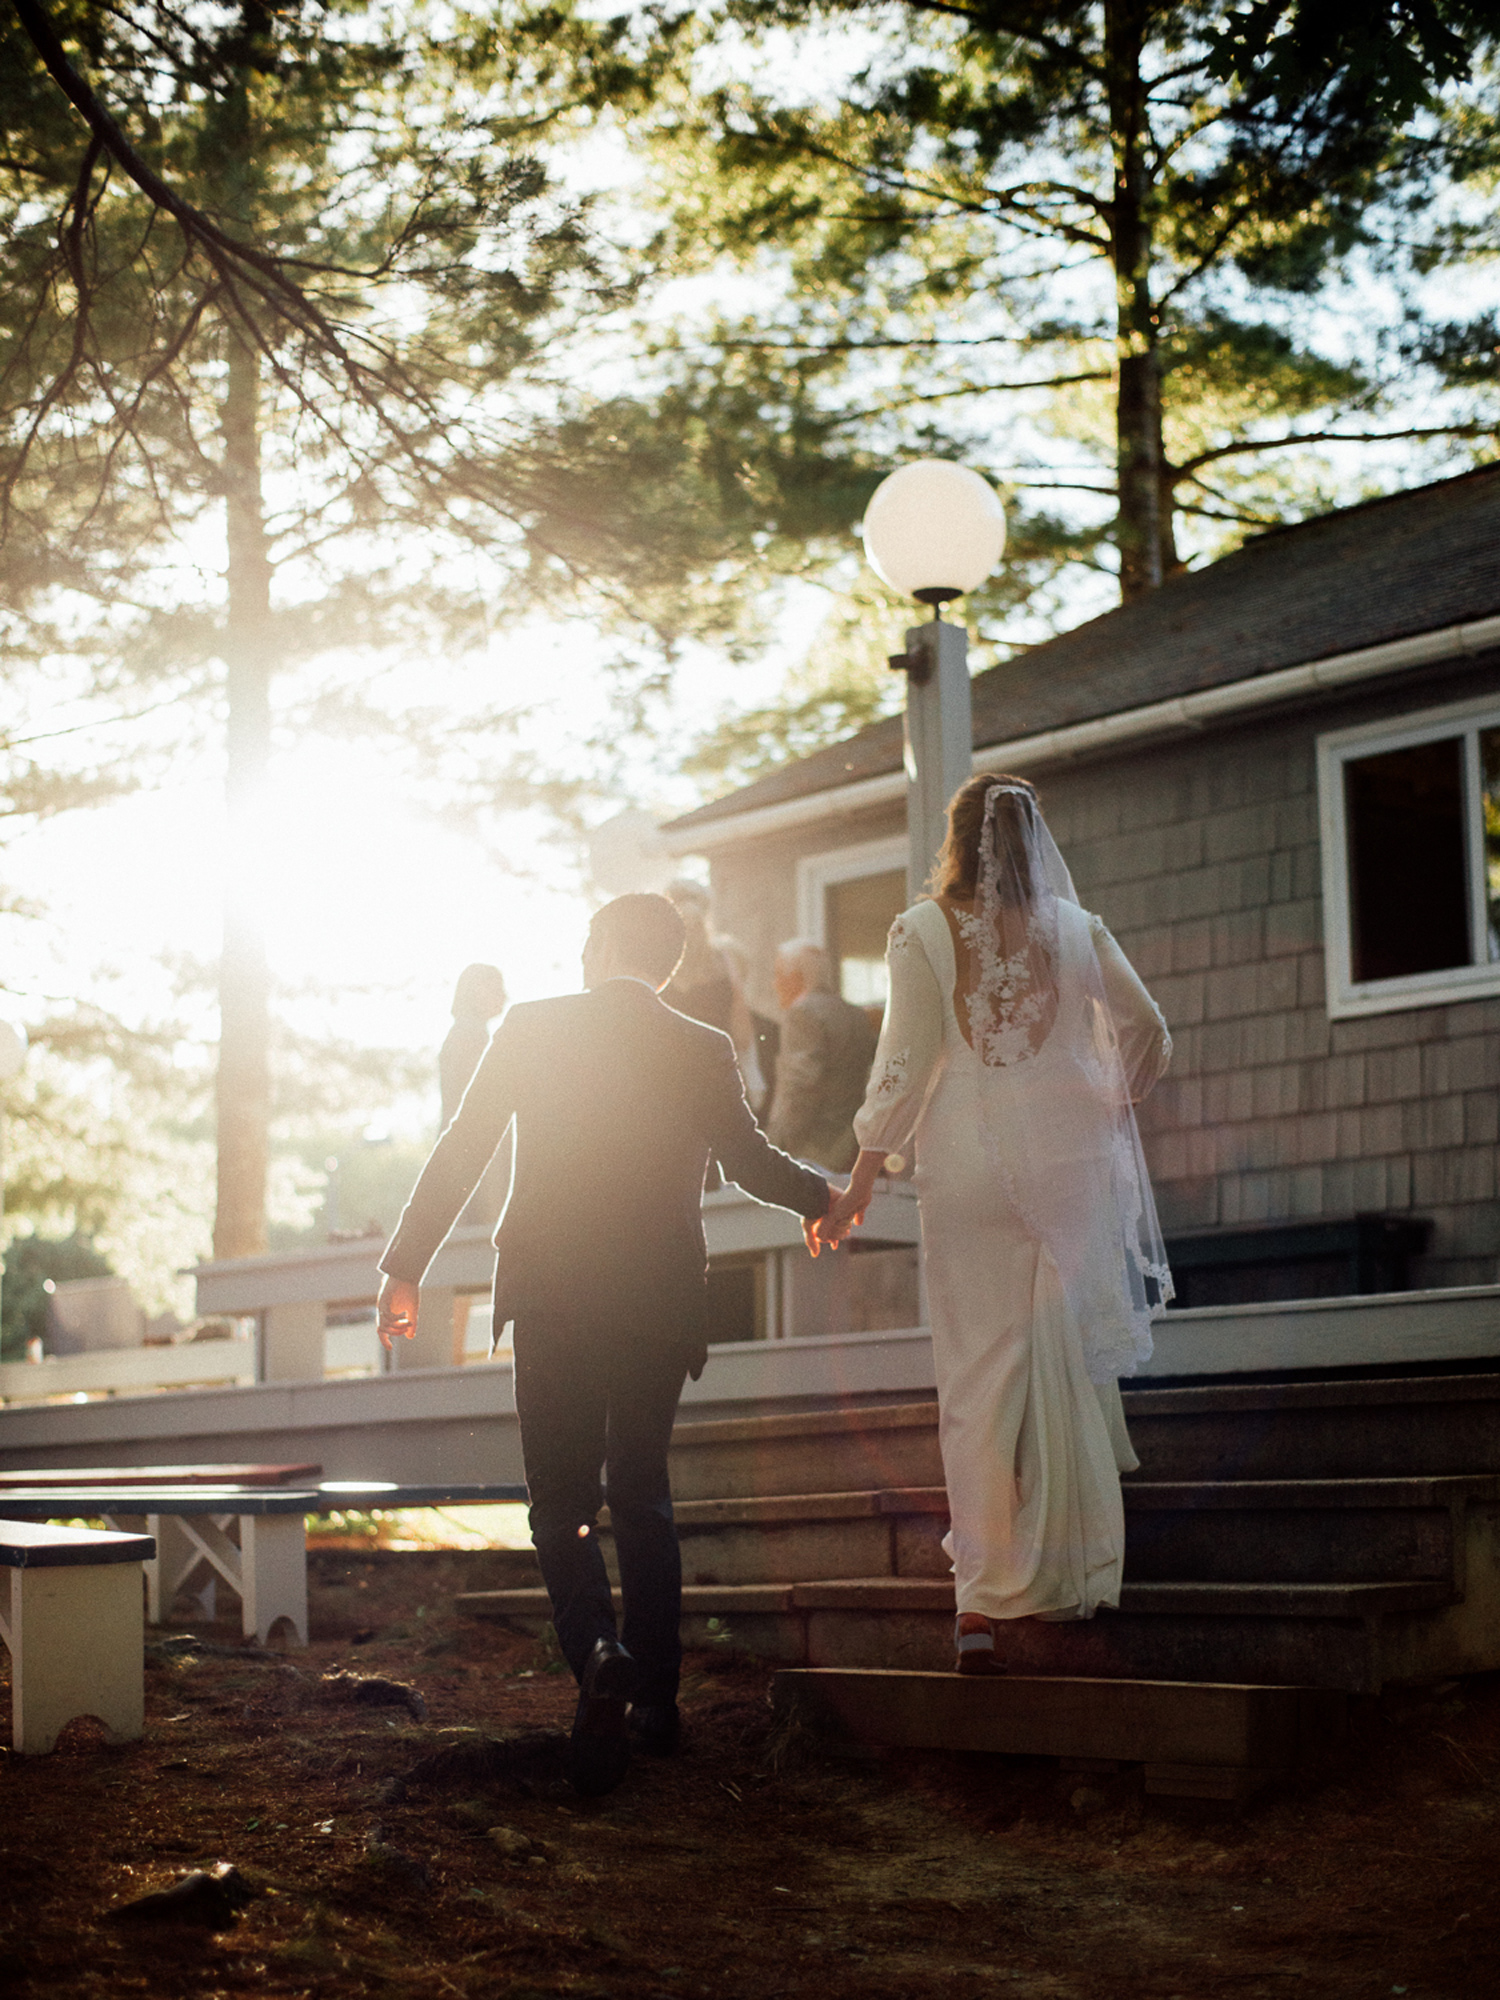 060-siousca-maineweddingphotographer-backyardwedding-mainewedding.jpg